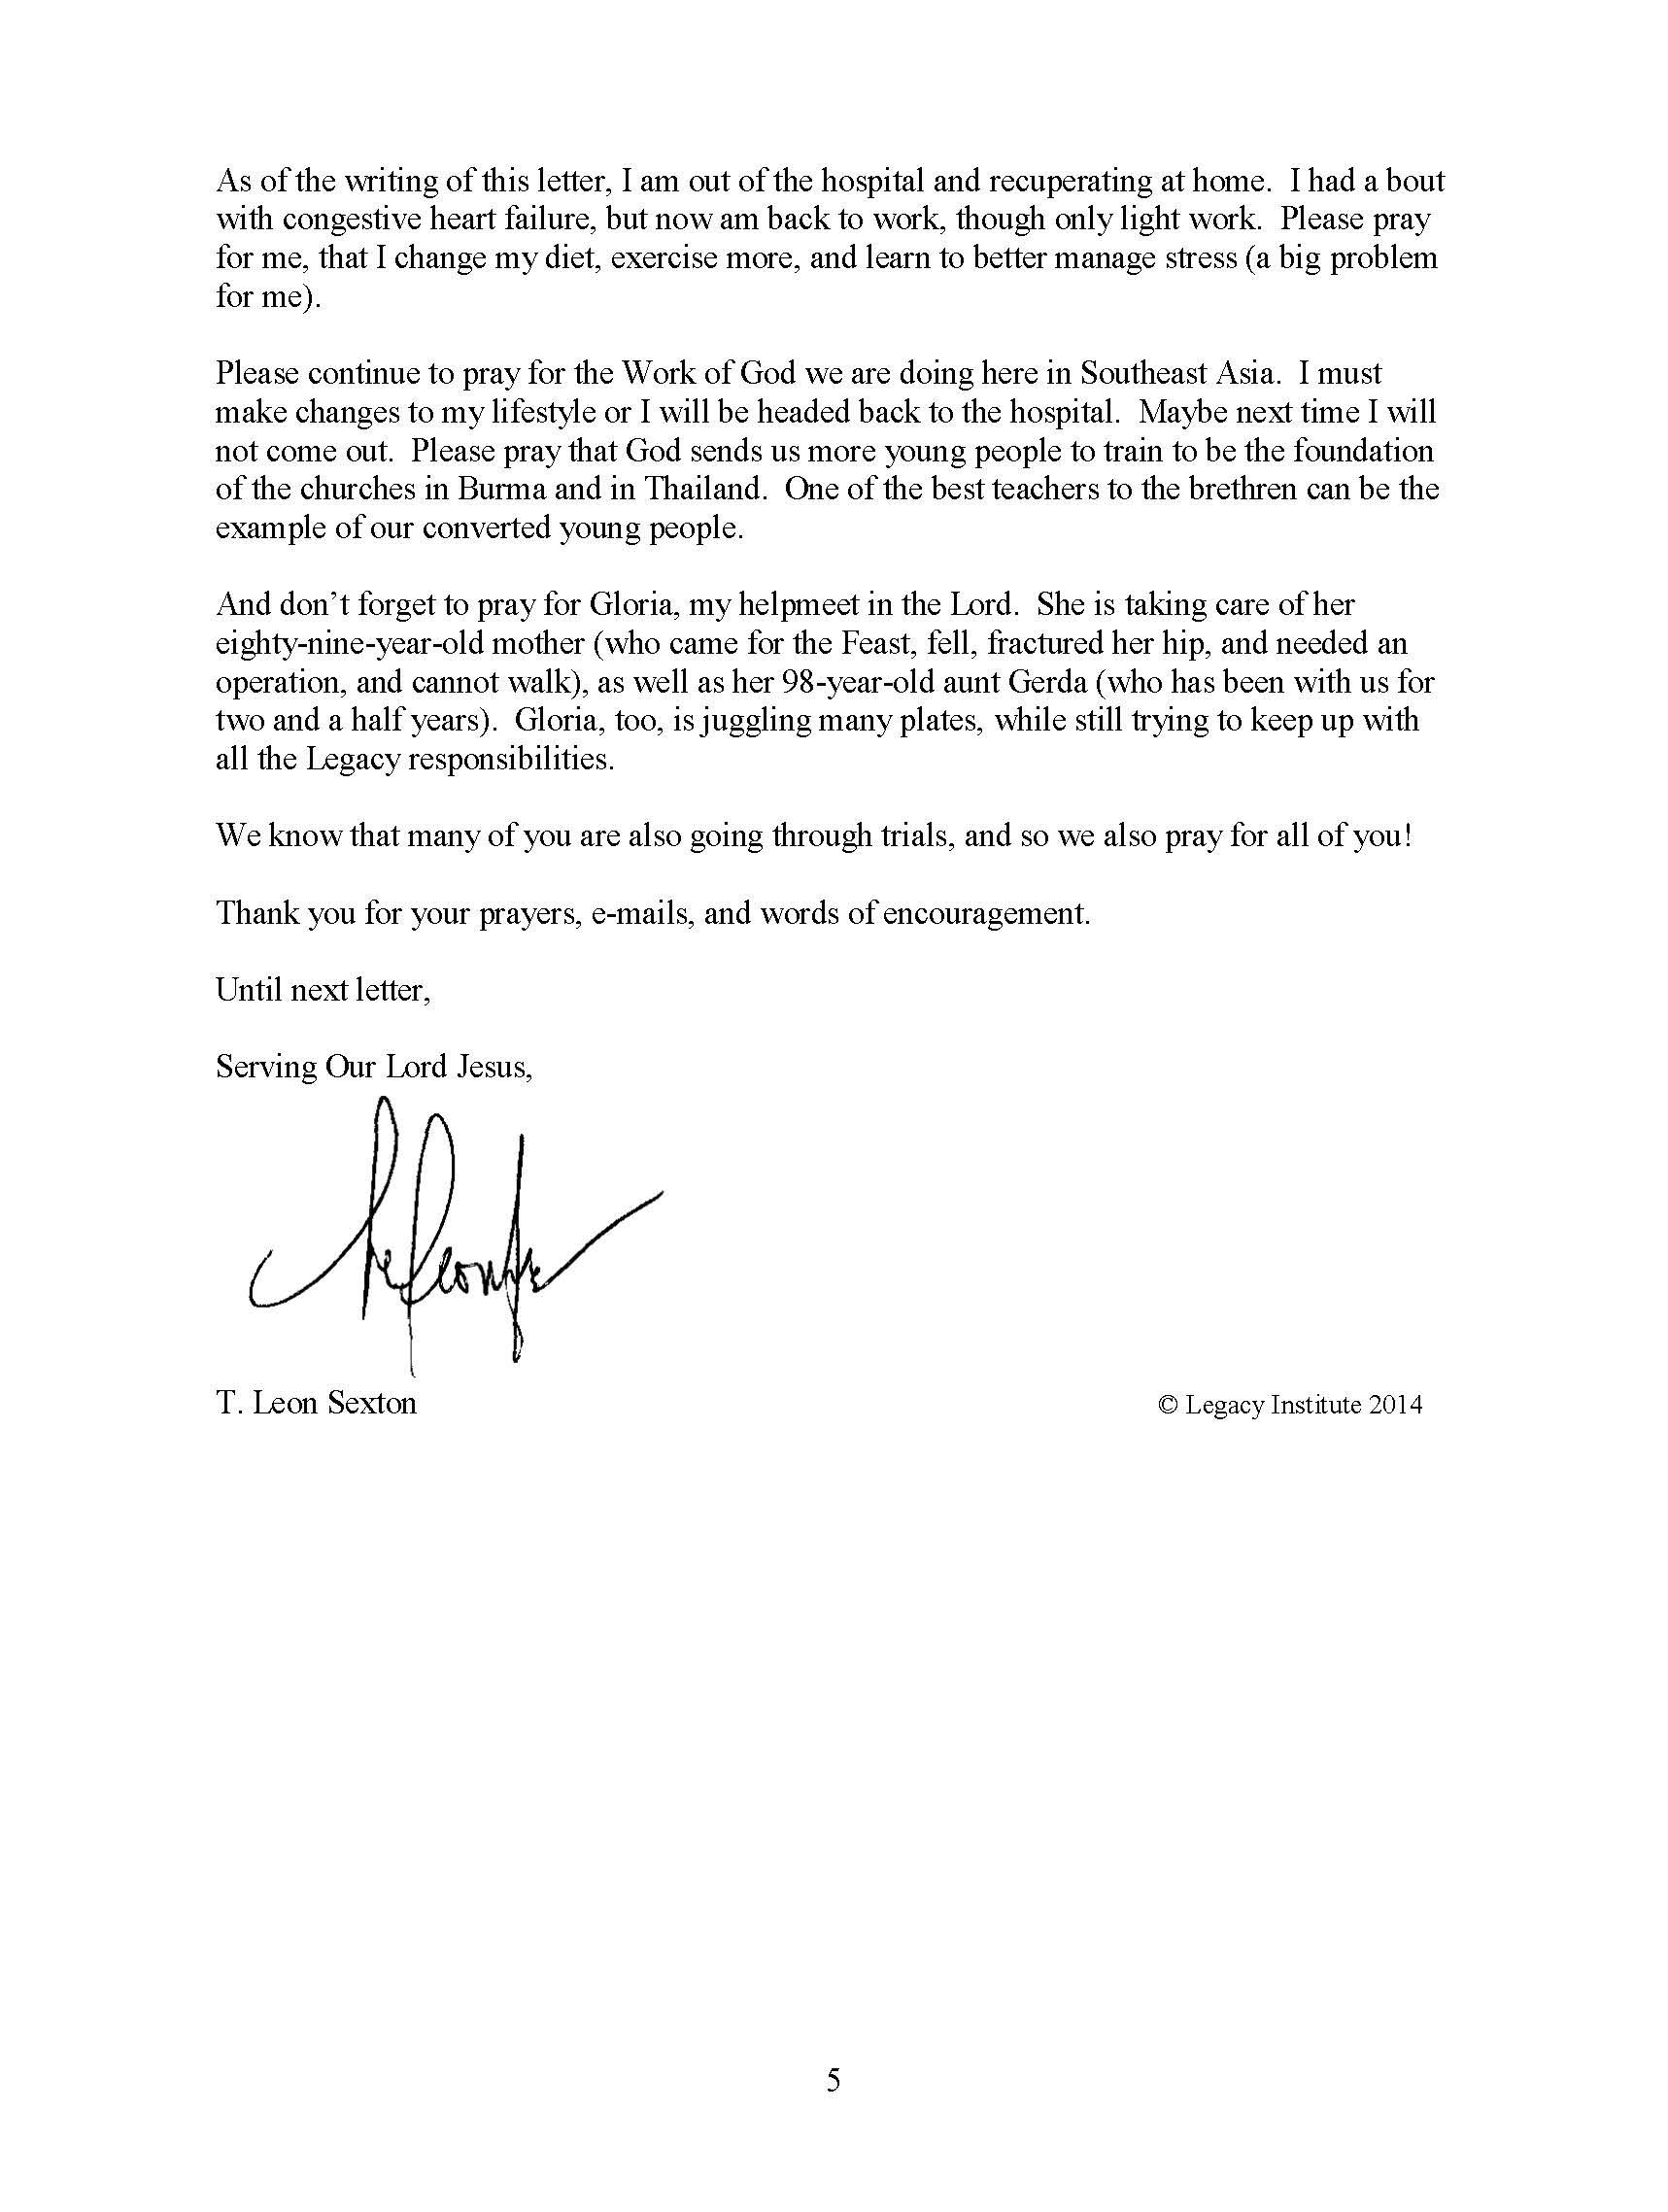 Legacy Letter November 2014_Page_5